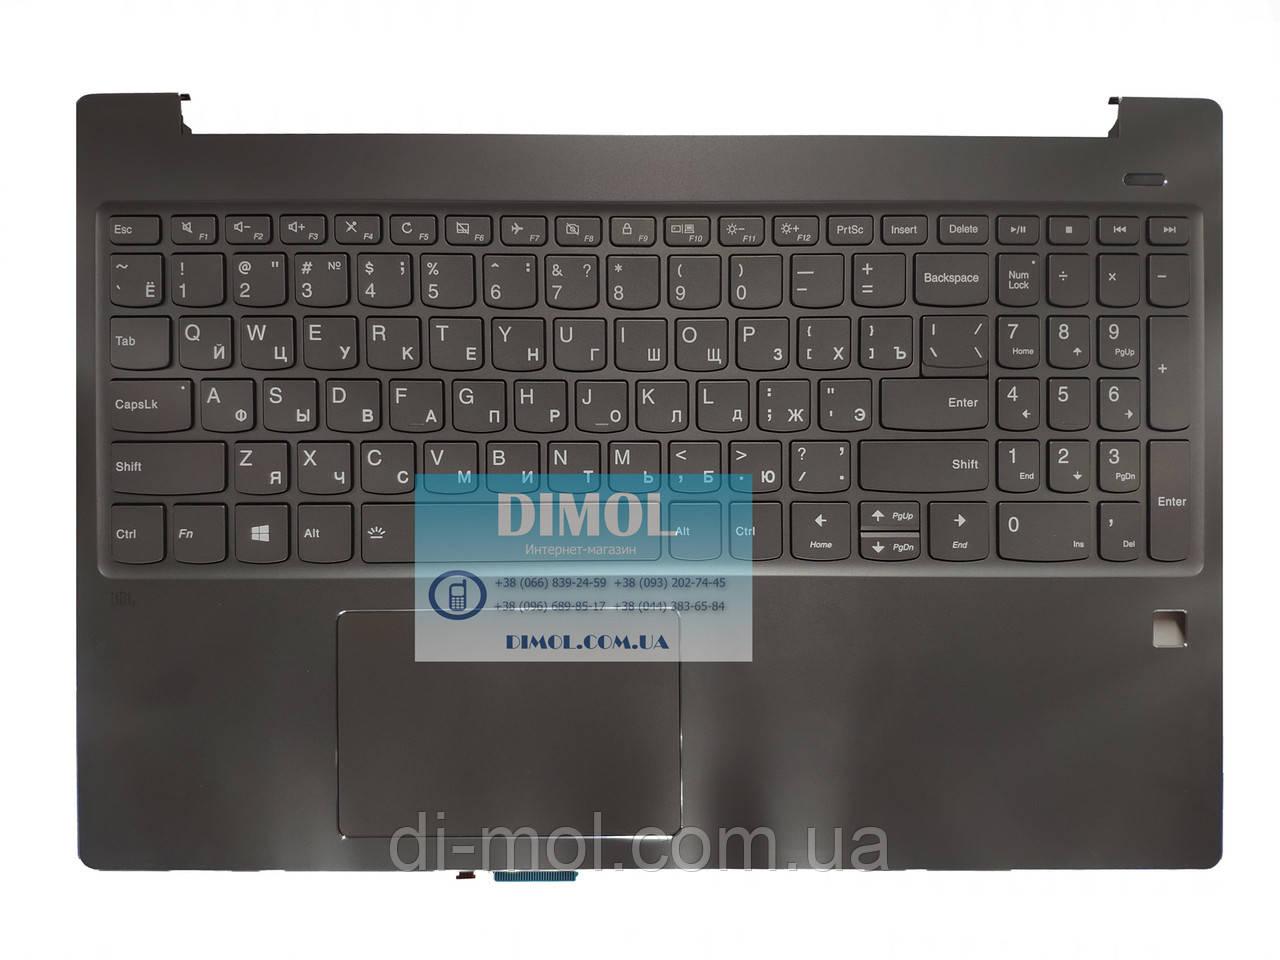 Оригинальная клавиатура для ноутбука Lenovo IdeaPad 720S-15IKB series, ru, gray, подсветка